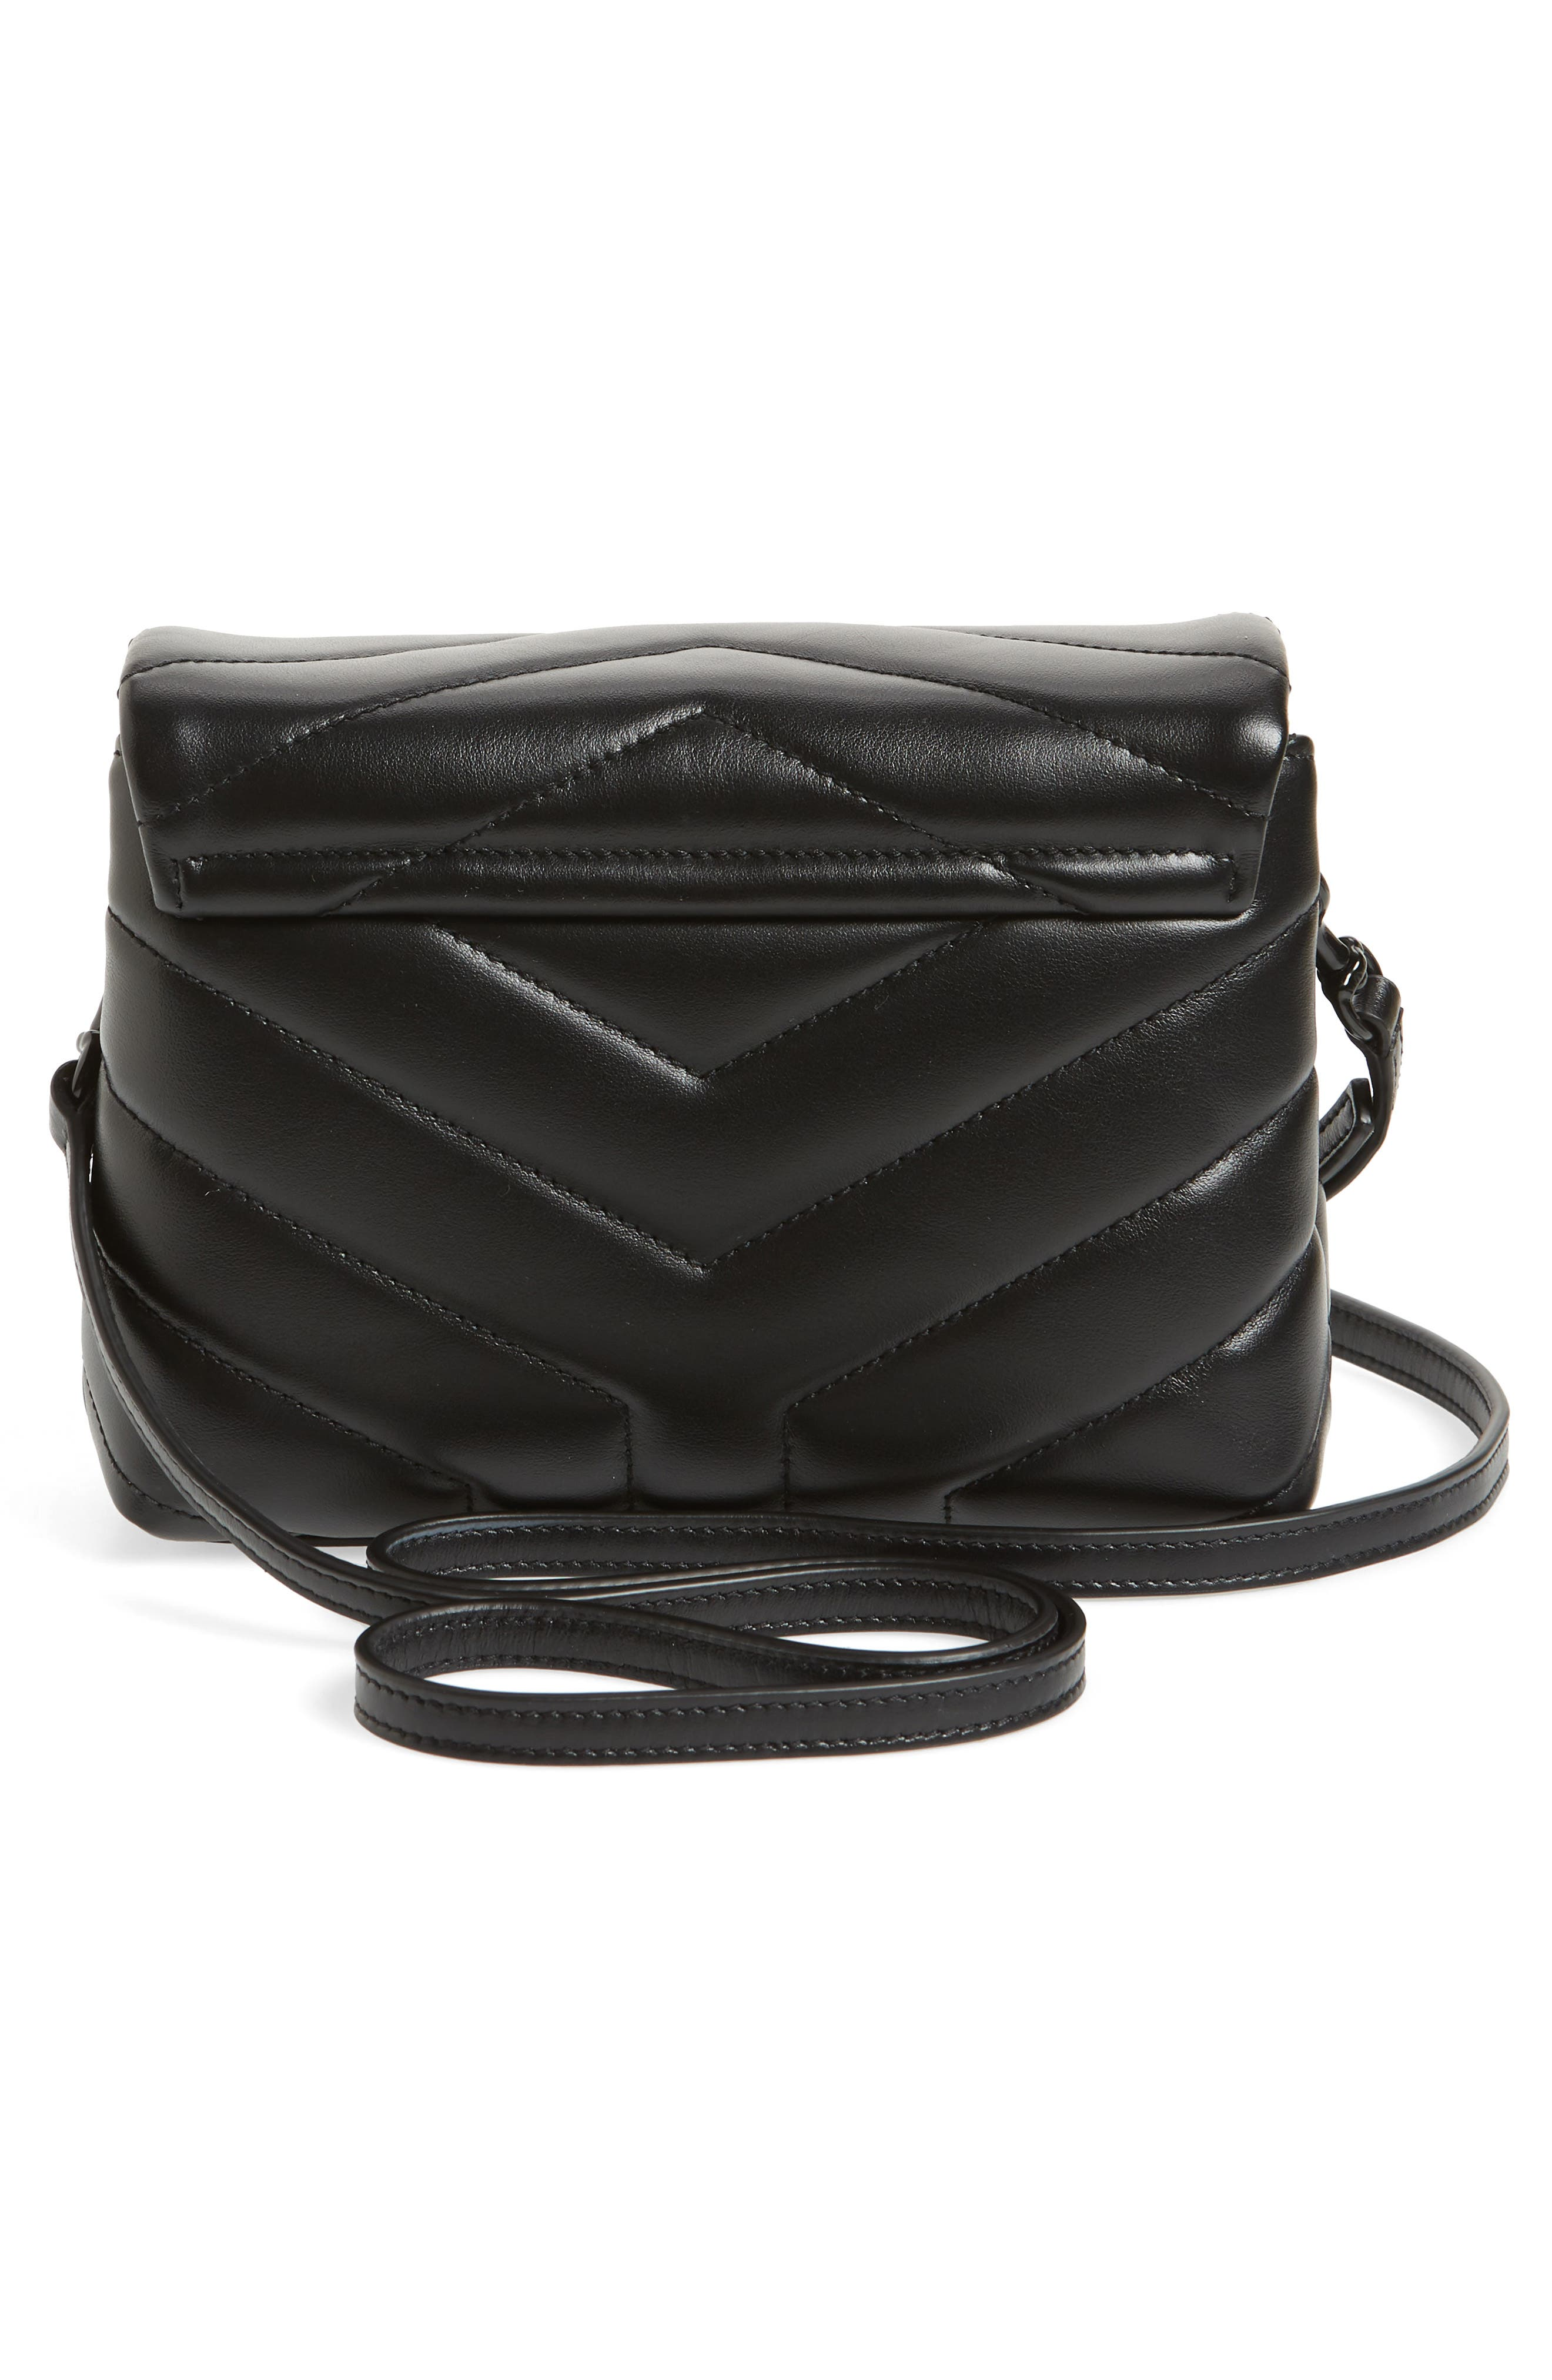 SAINT LAURENT, Toy Loulou Leather Crossbody Bag, Alternate thumbnail 3, color, 001